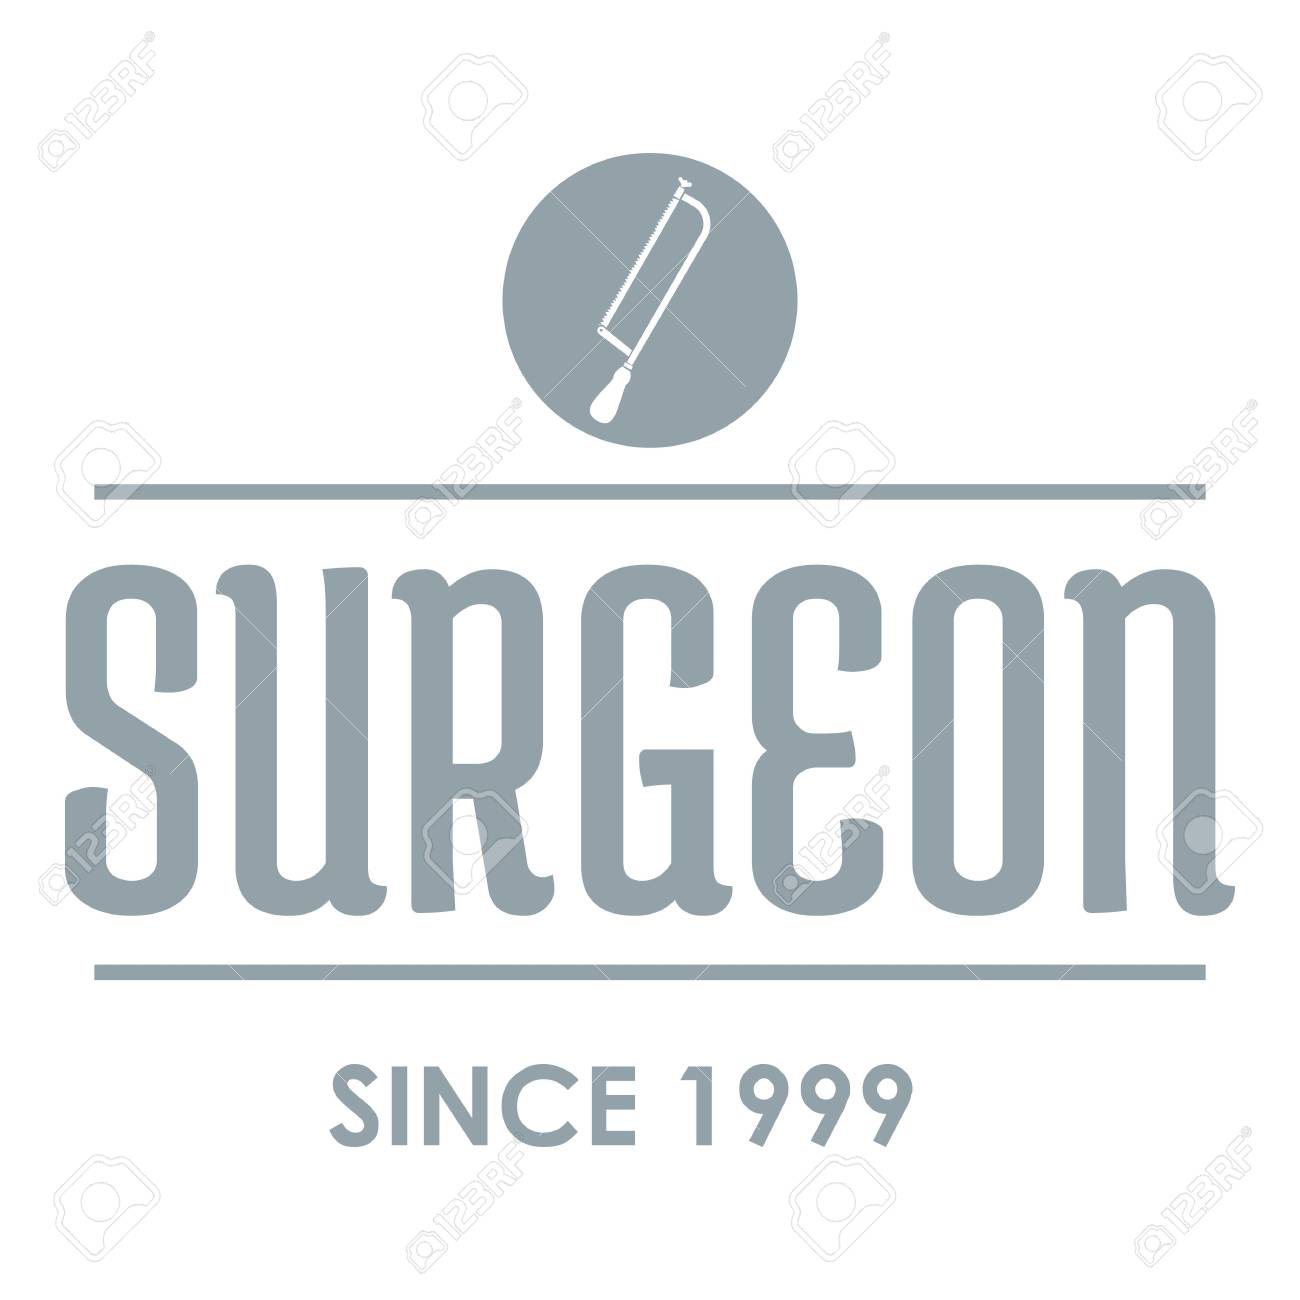 Surgeon Logo Gray Monochrome Illustration Of Surgeon Vector Royalty Free Cliparts Vectors And Stock Illustration Image 88023959